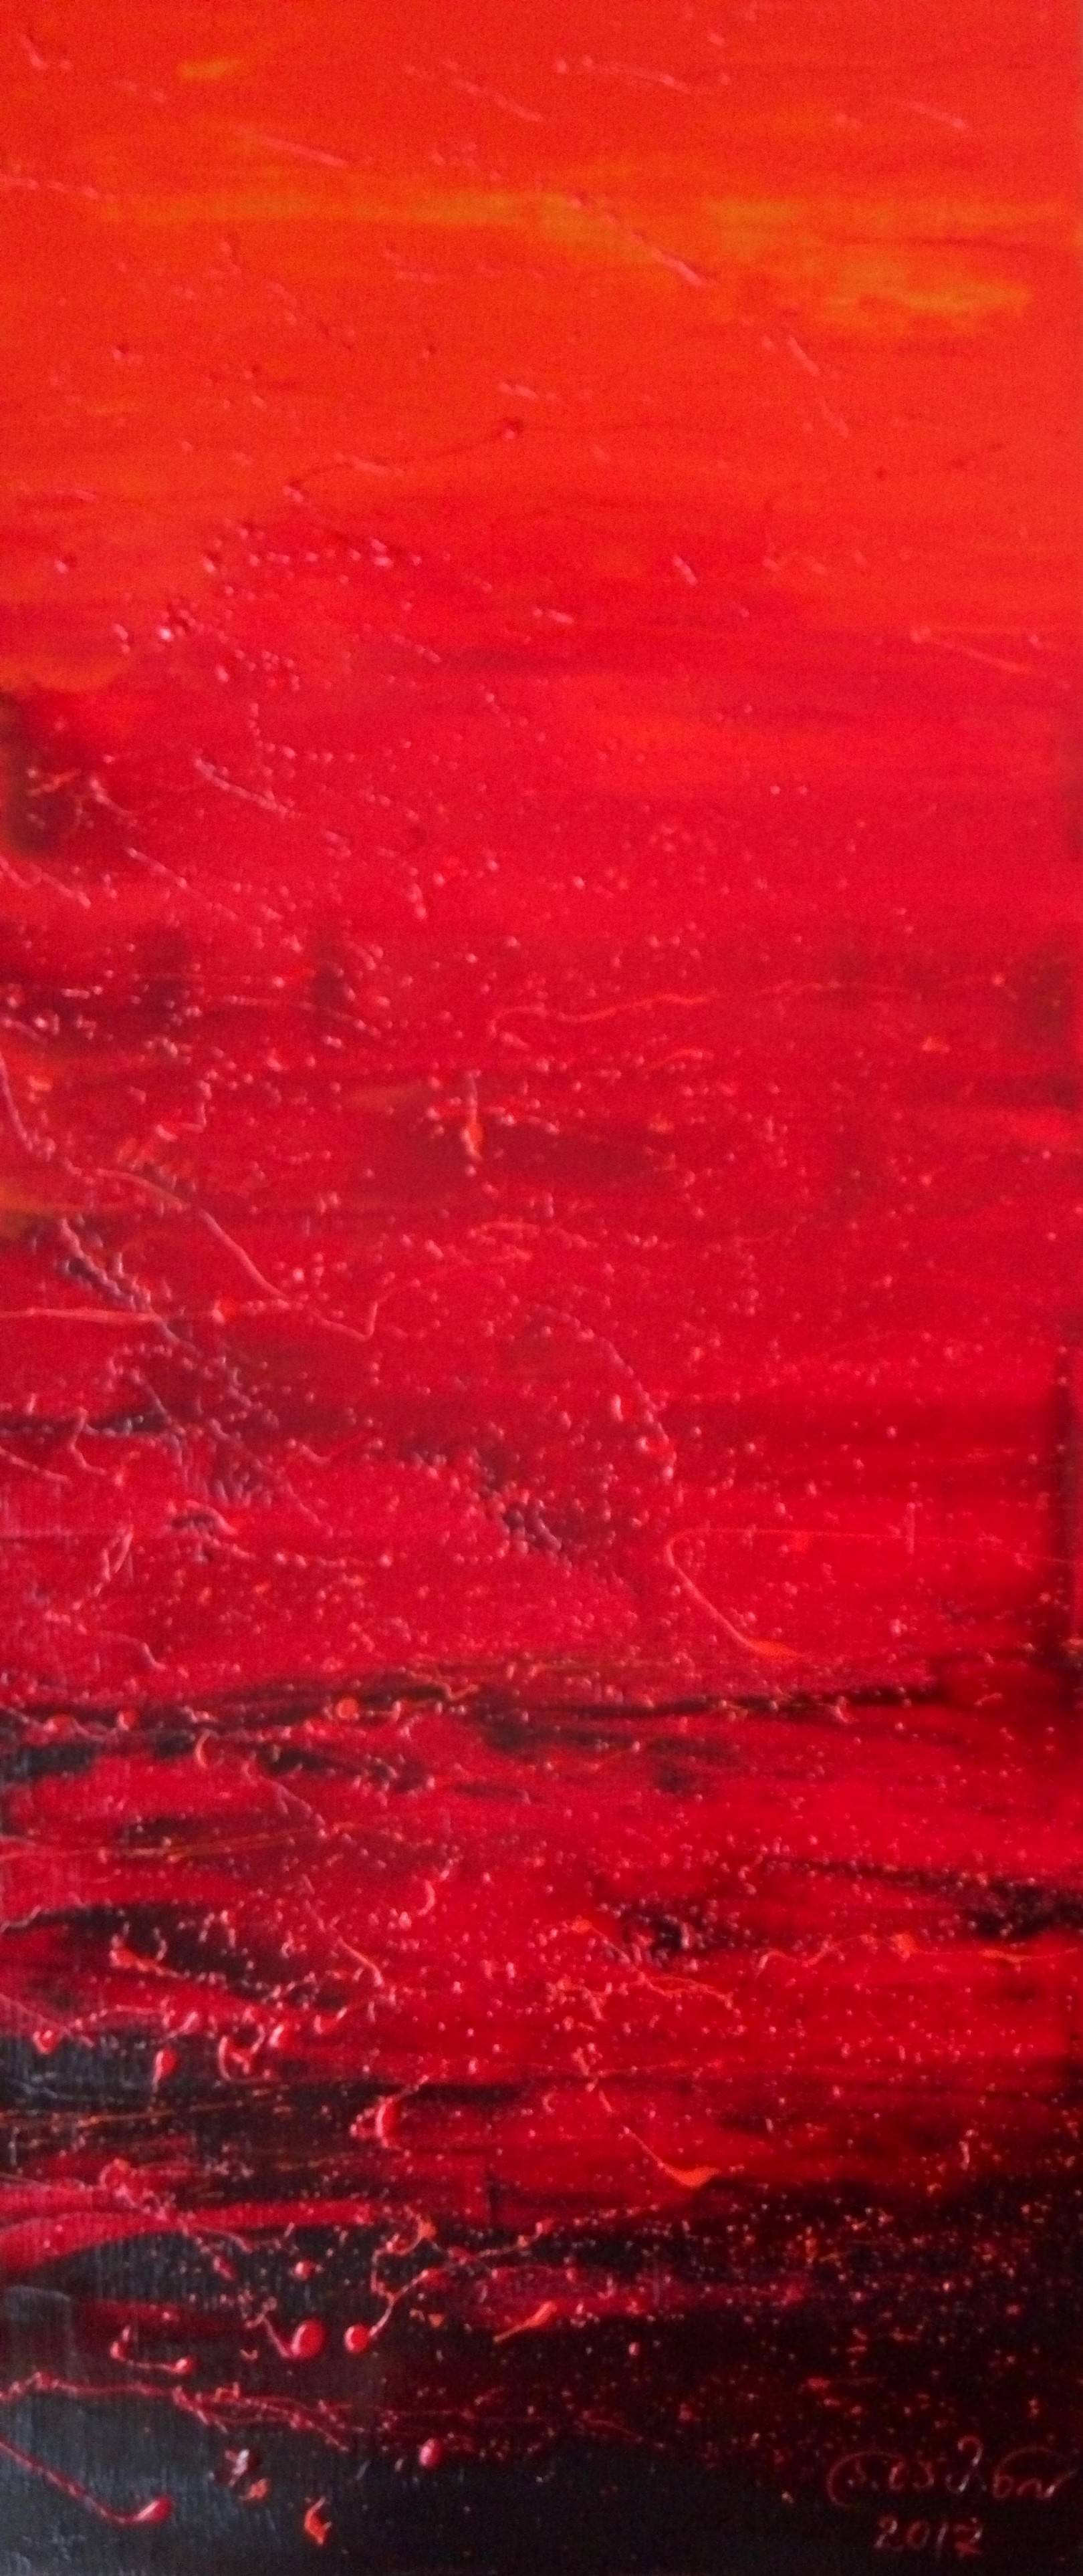 «Красный полдень»    холст, масло «Red midday»    oil on canvas                                                 70x30,  2017